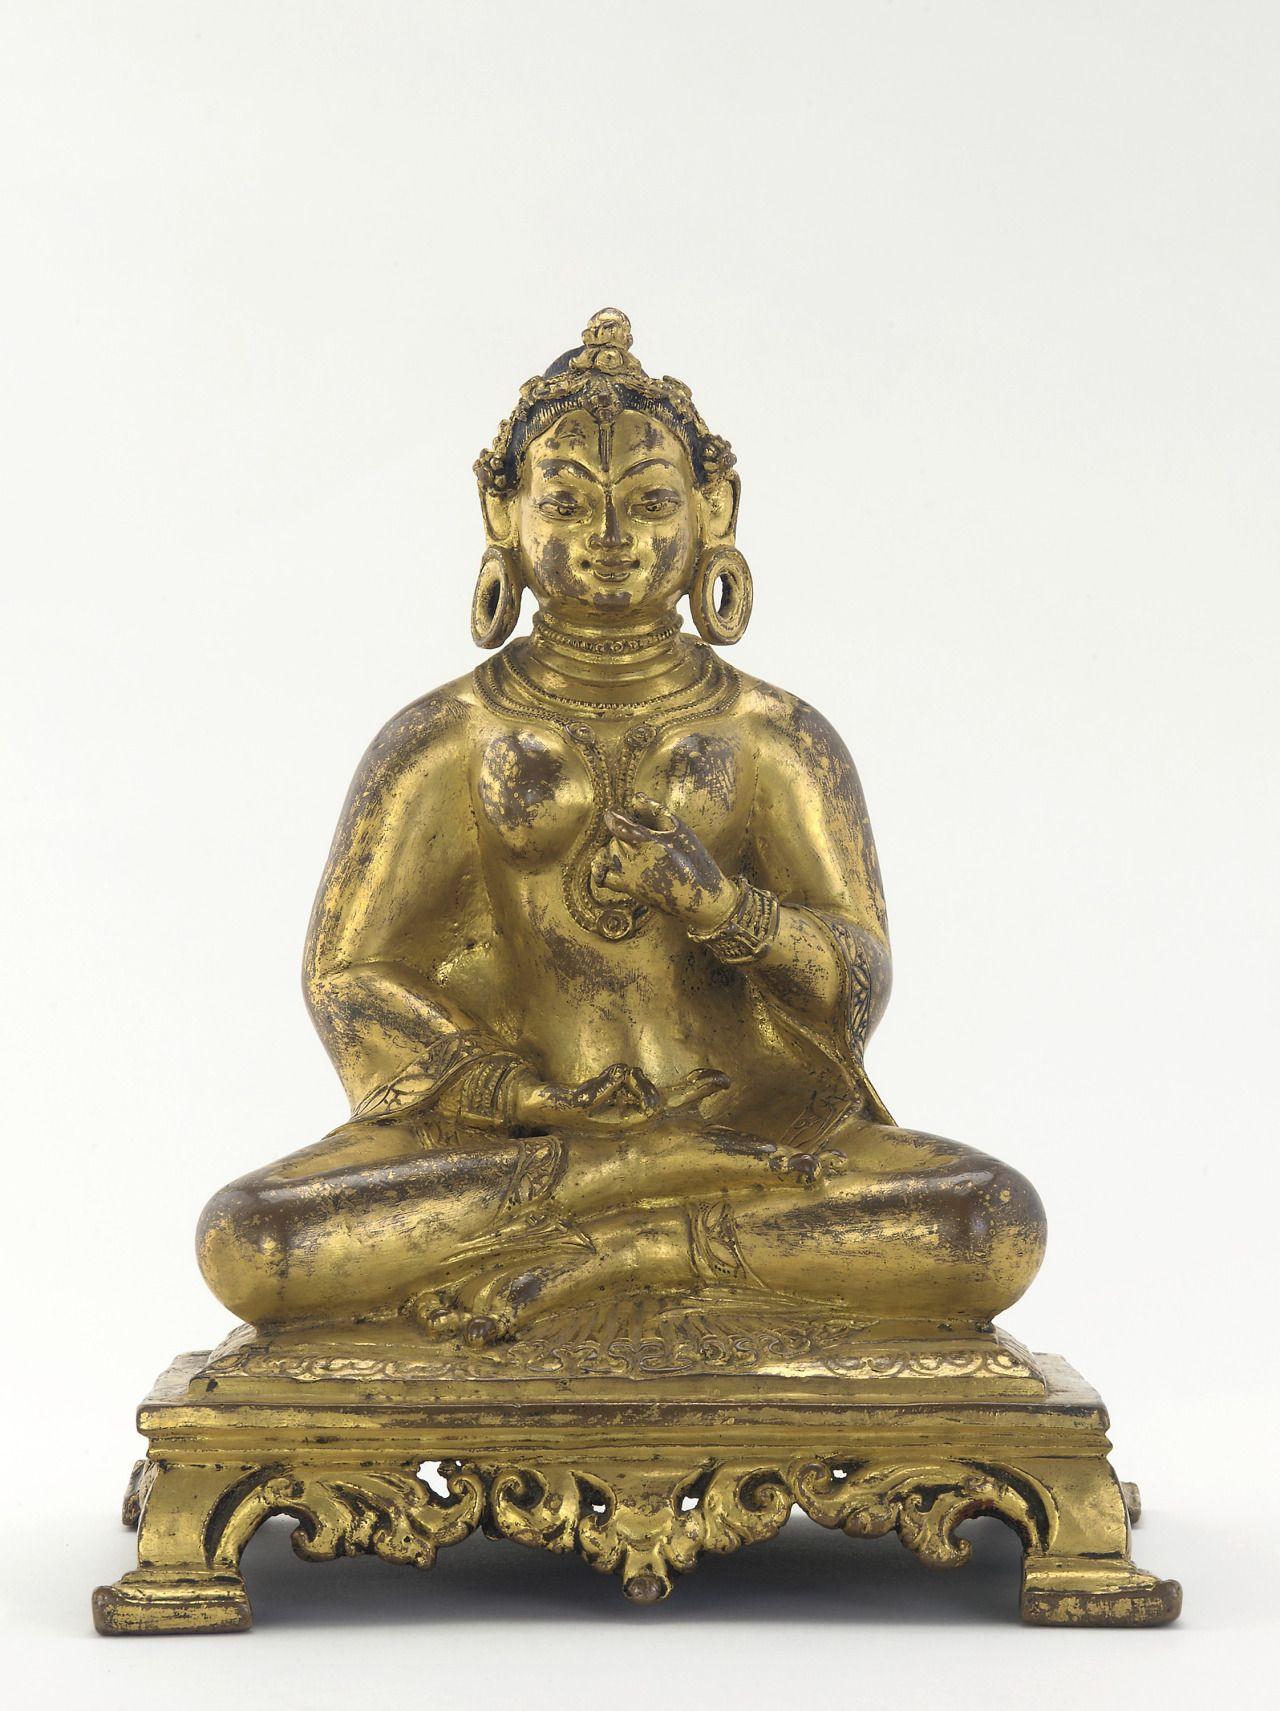 ganymedesrocks: fishstickmonkey: Queen as the Goddess Prajnaparamita ...